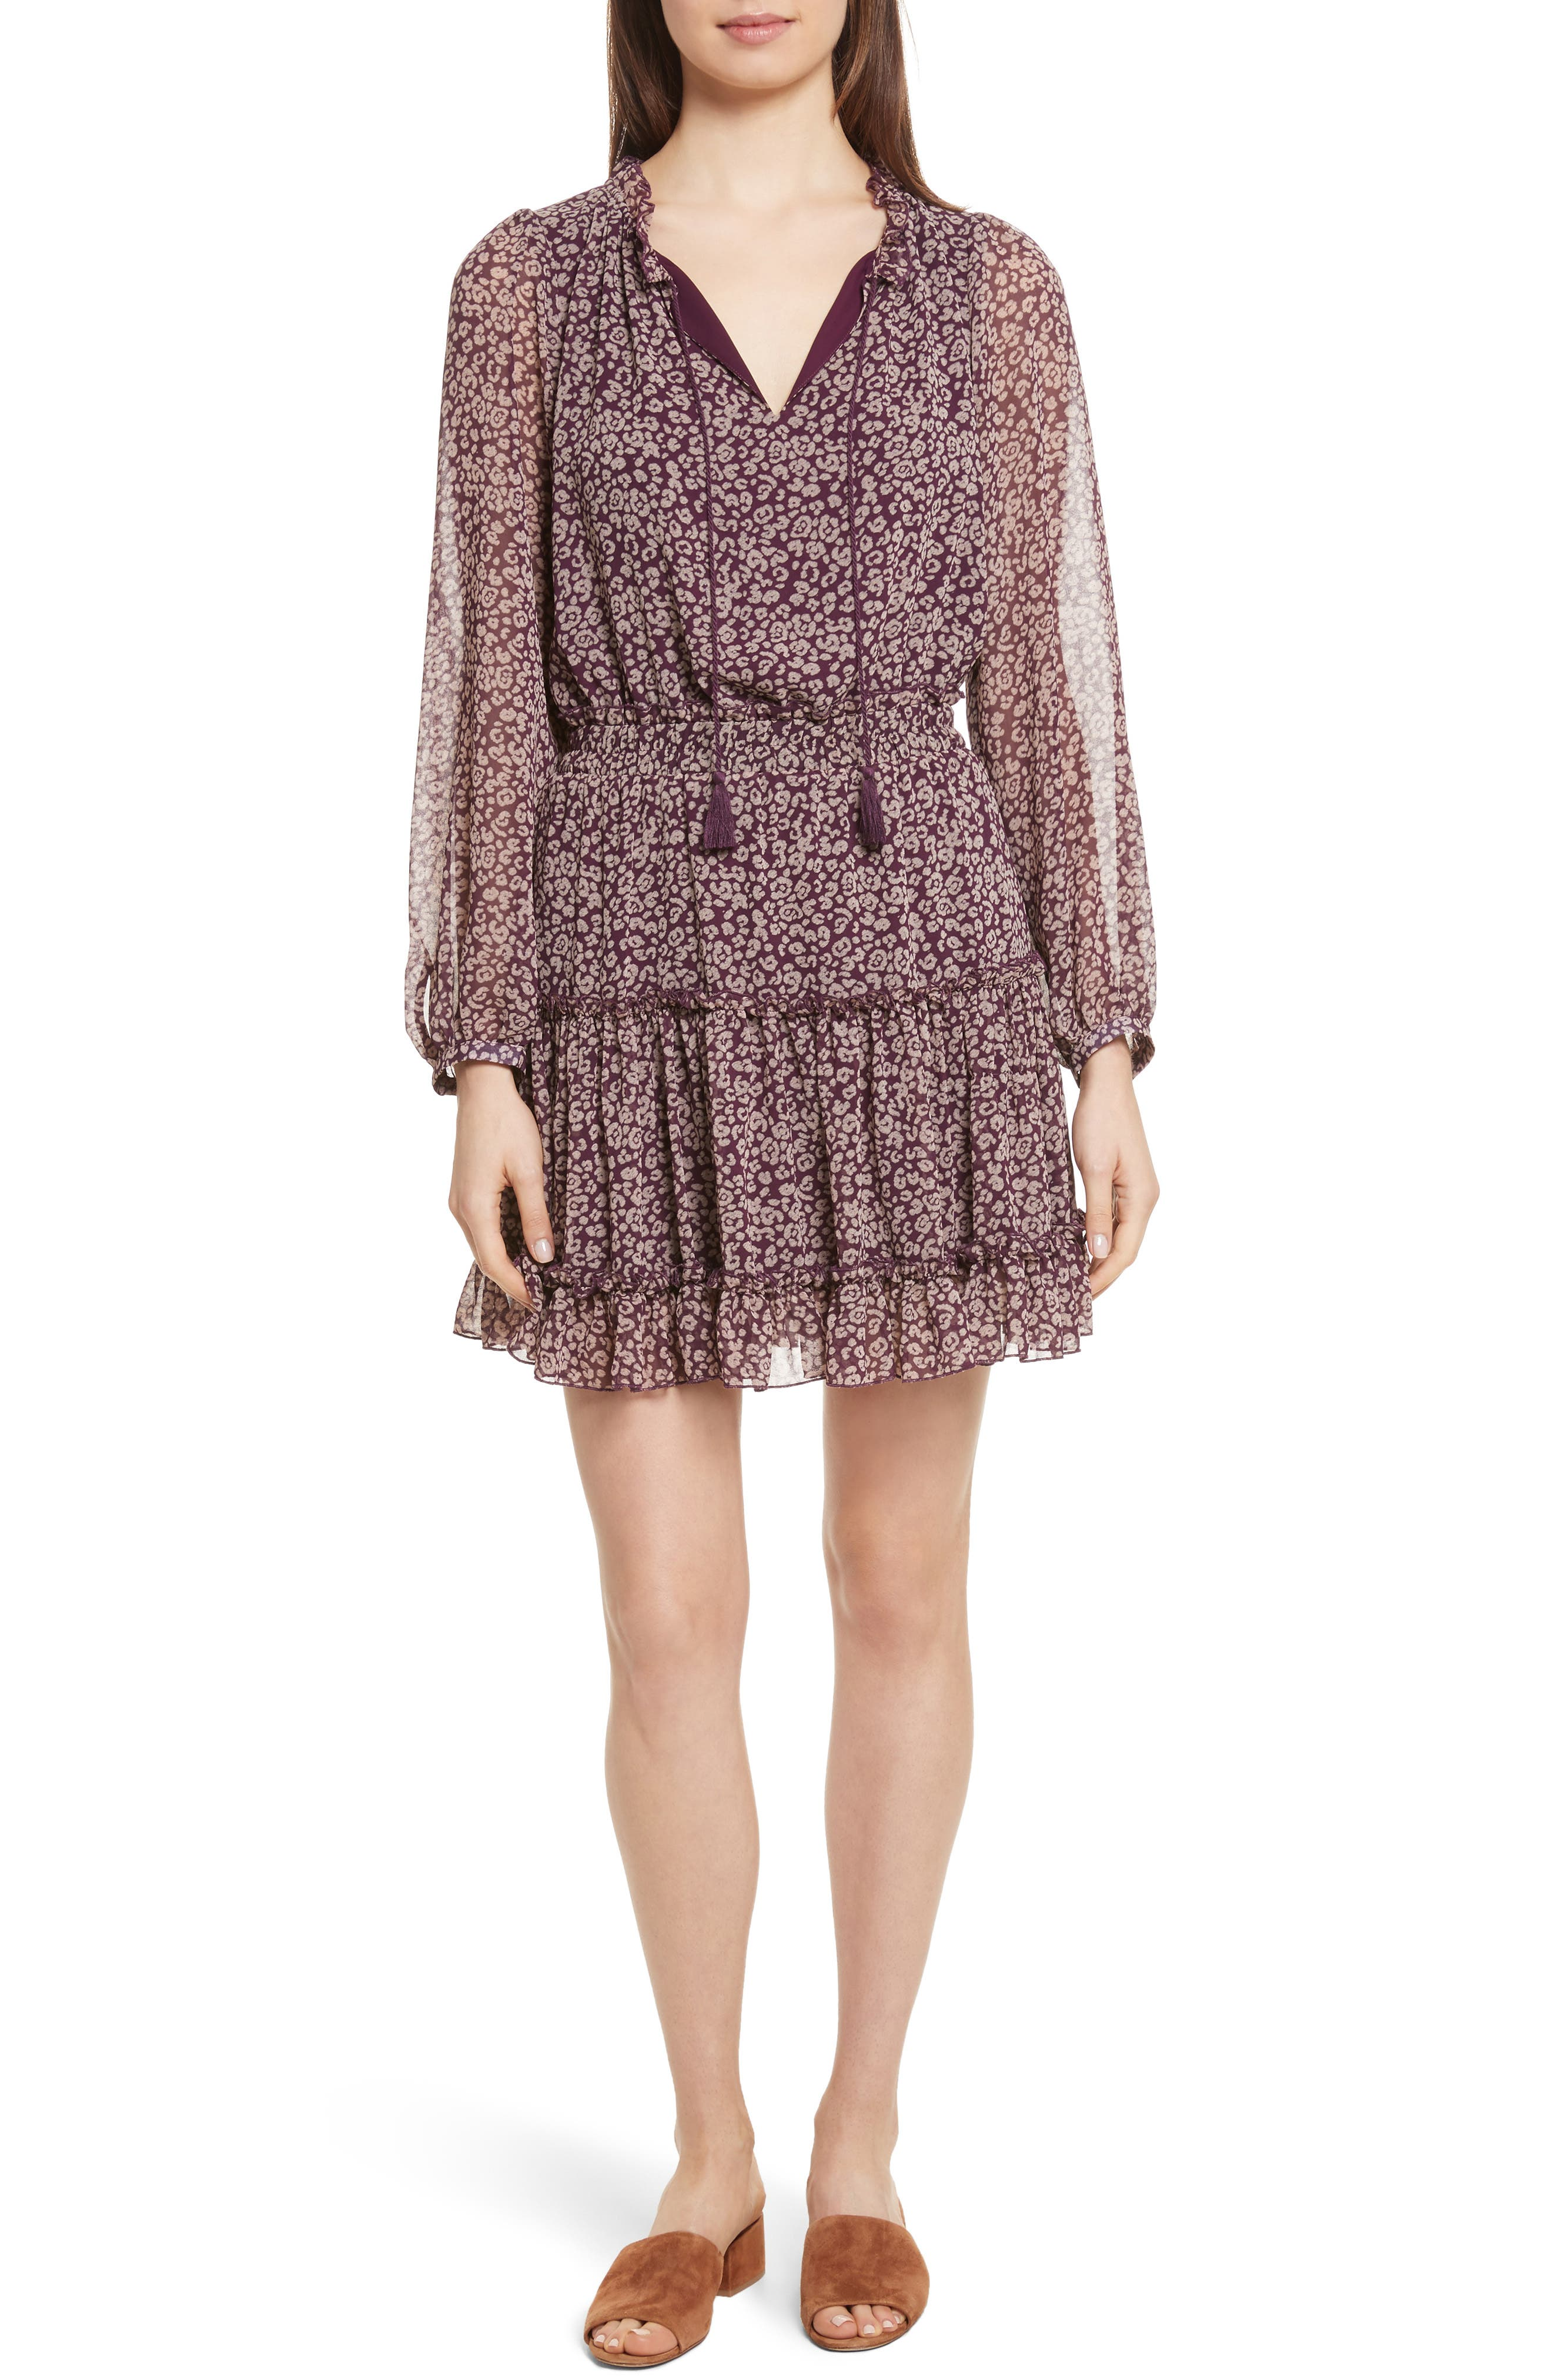 Rebecca Minkoff Rosemary A-Line Dress